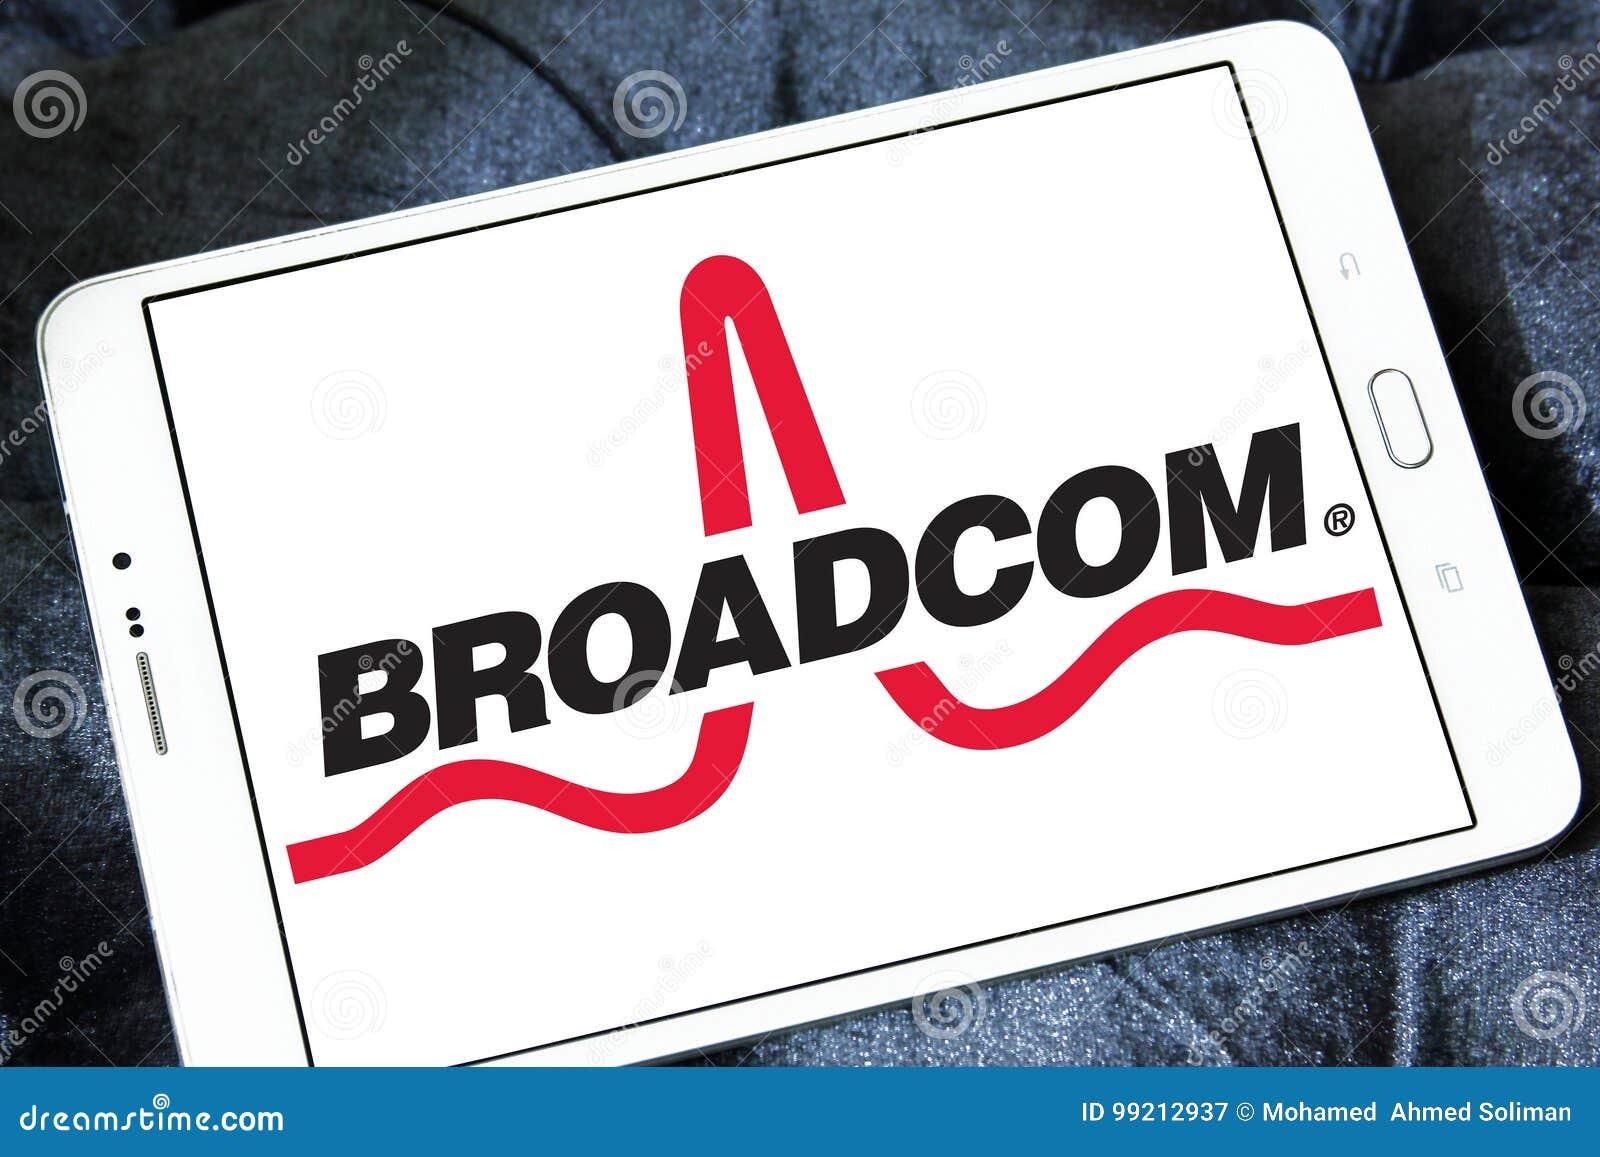 Broadcom company logo editorial photography  Image of